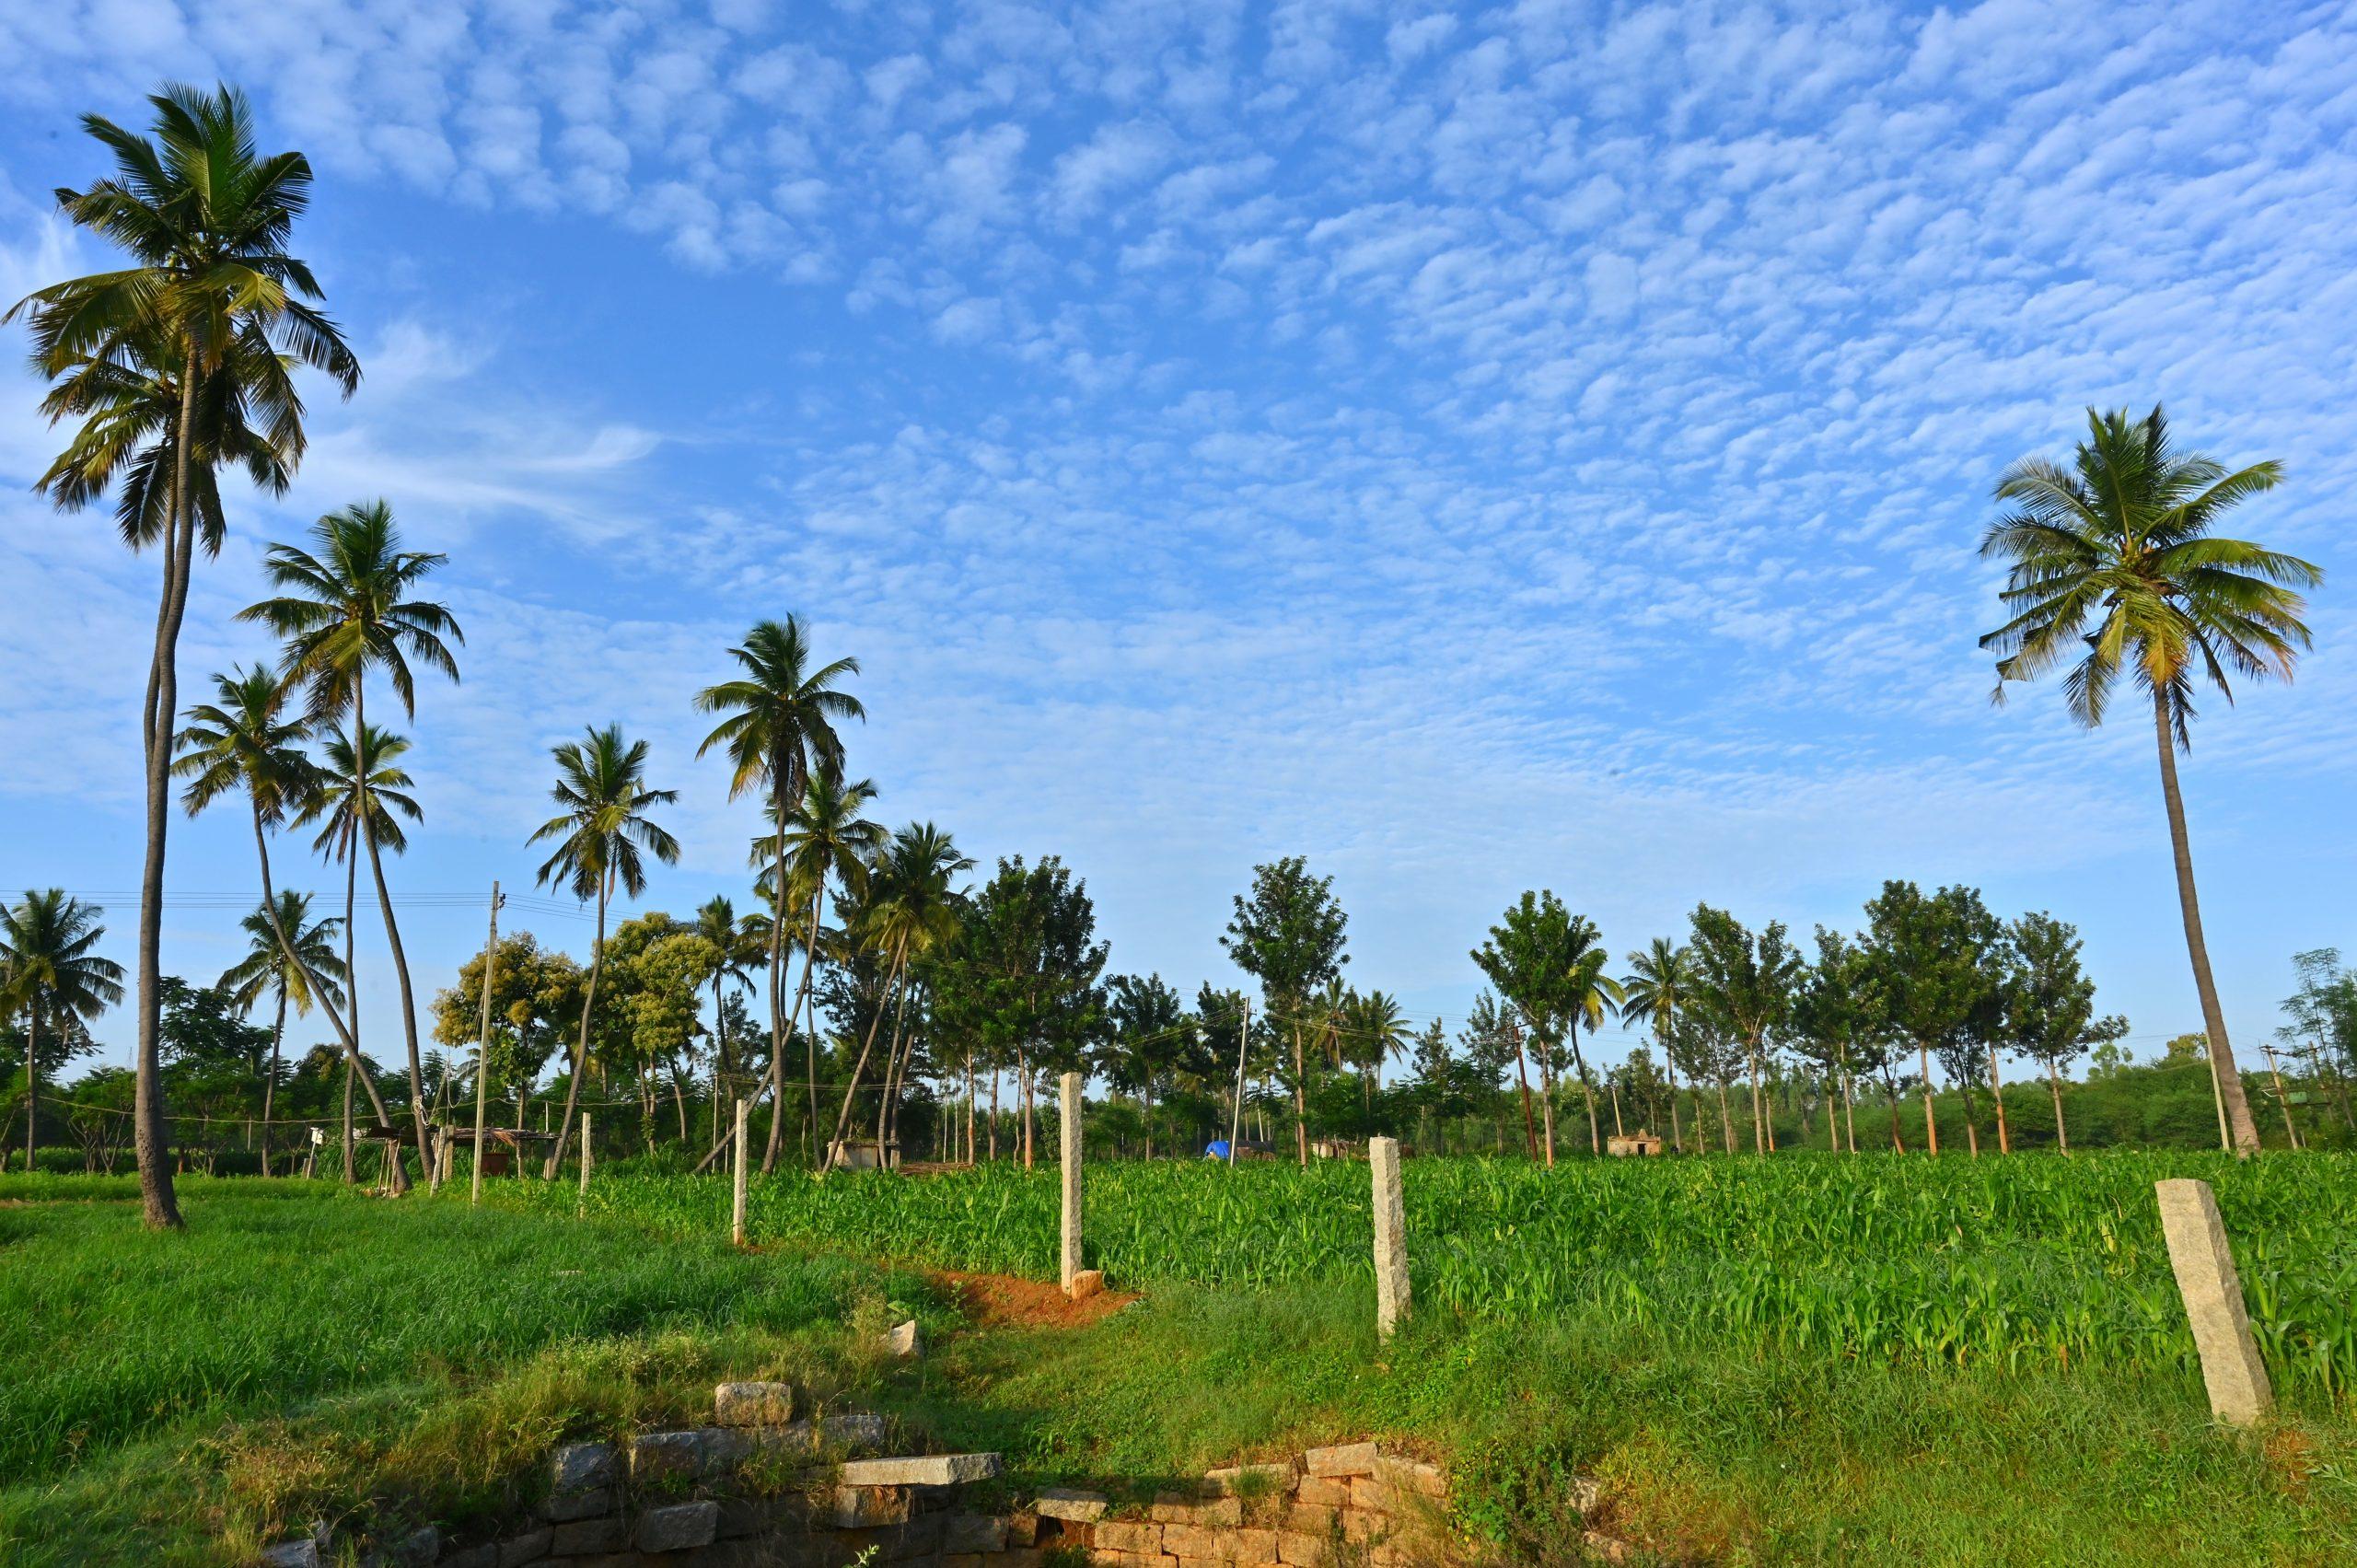 Coconut trees in the farm